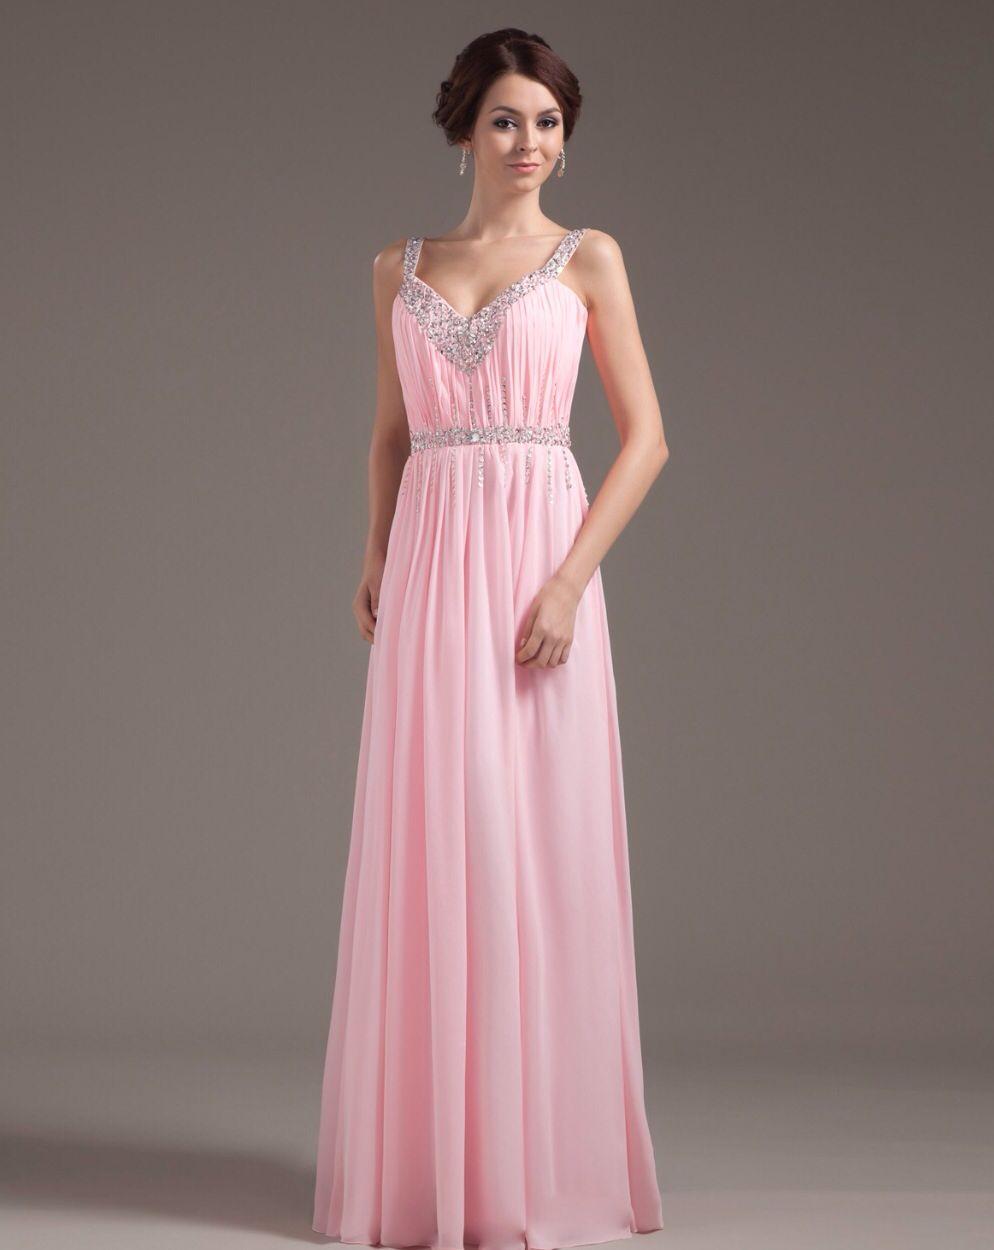 Baby pink maxi prom dress | Prom | Pinterest